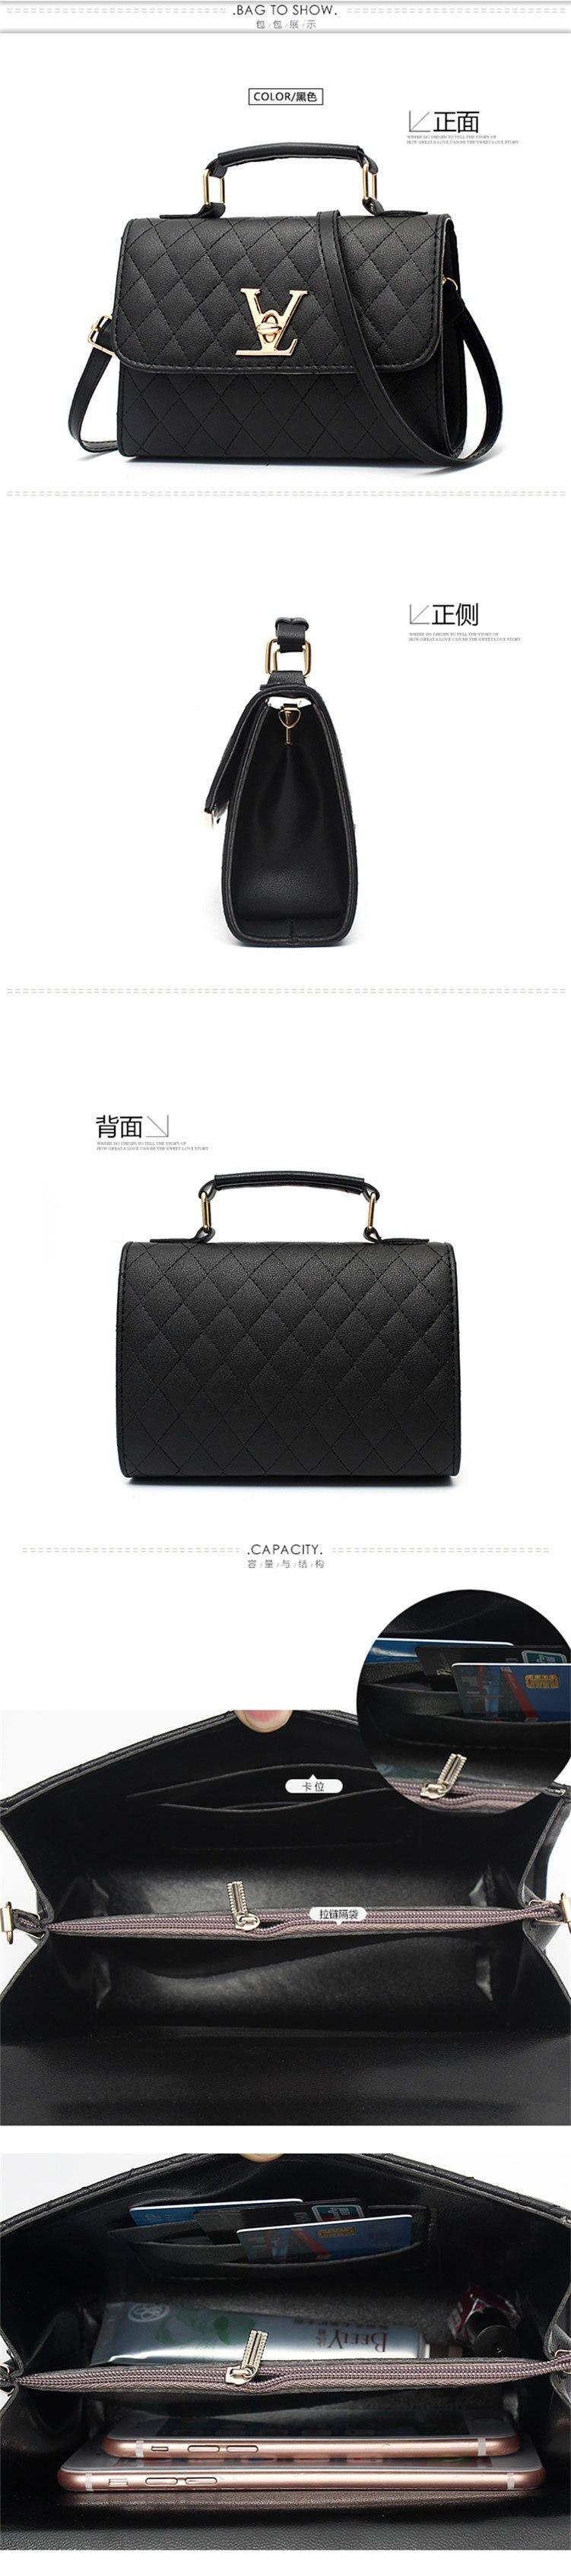 crossbody para marcas famosas sacos mensageiro louis bolsa